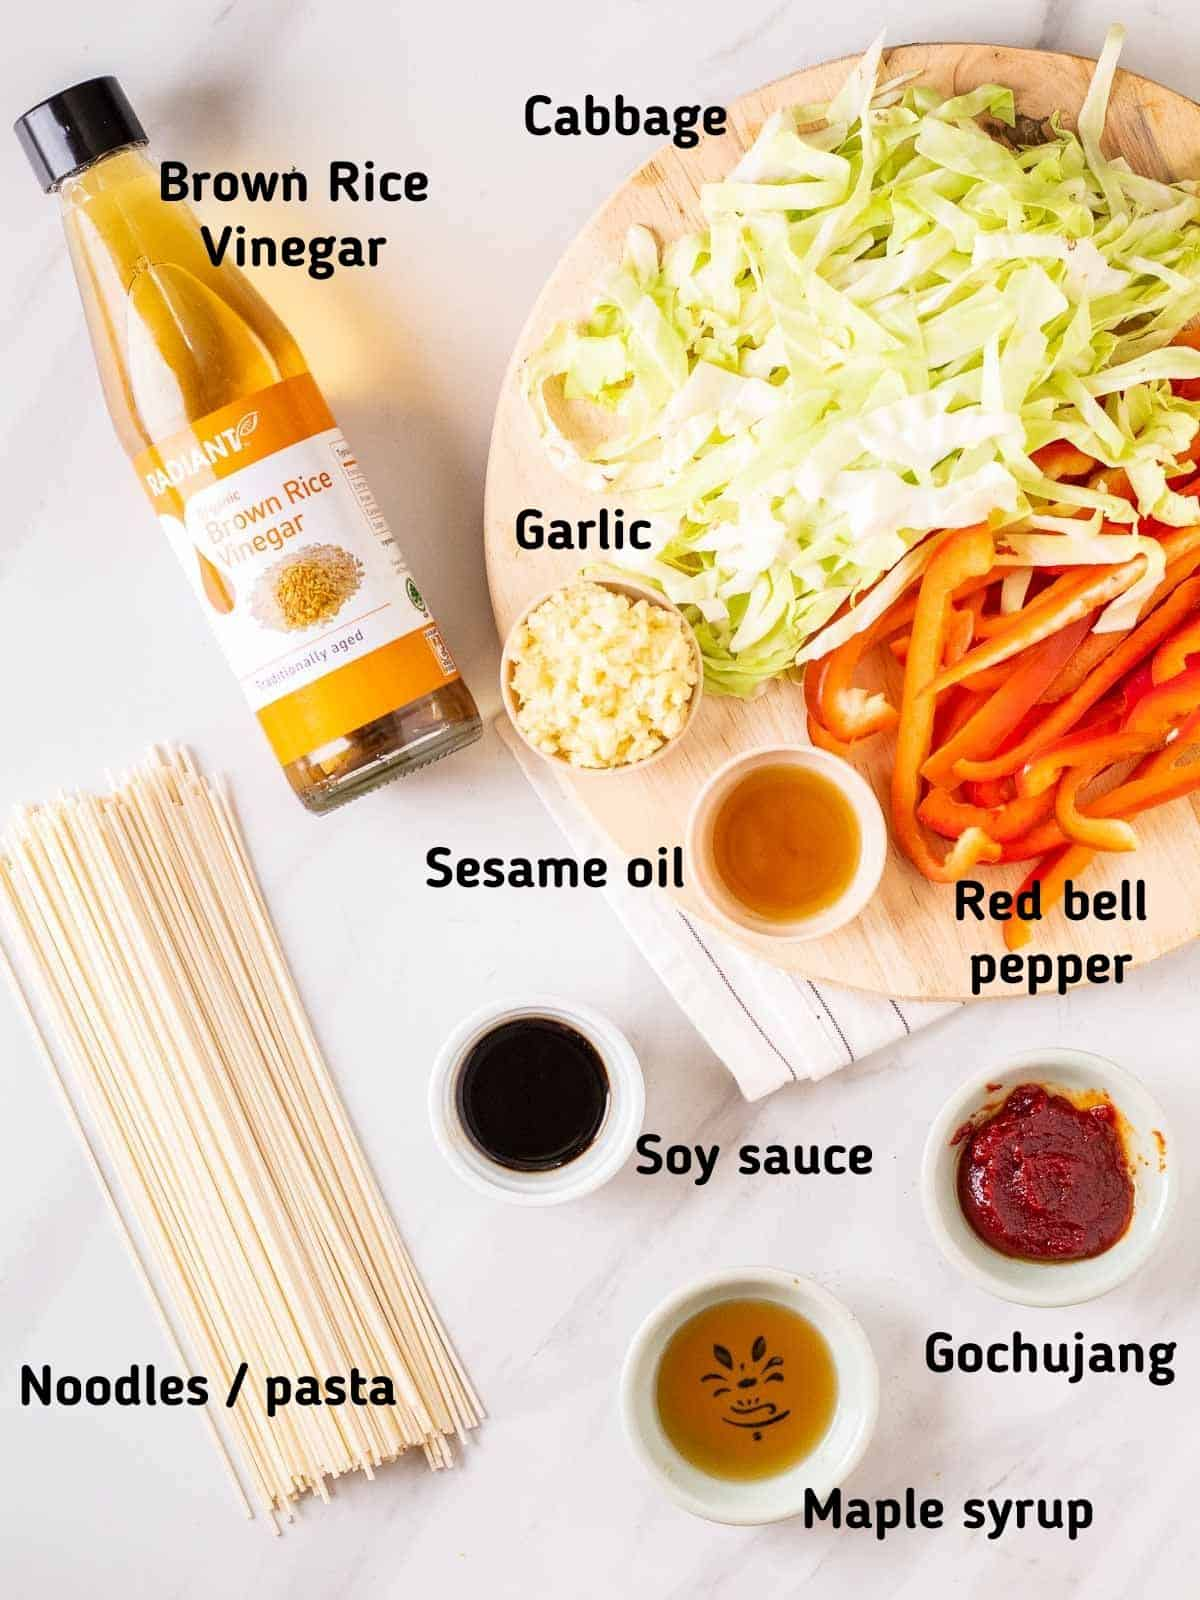 Ingredients needed to make gochujang noodles.